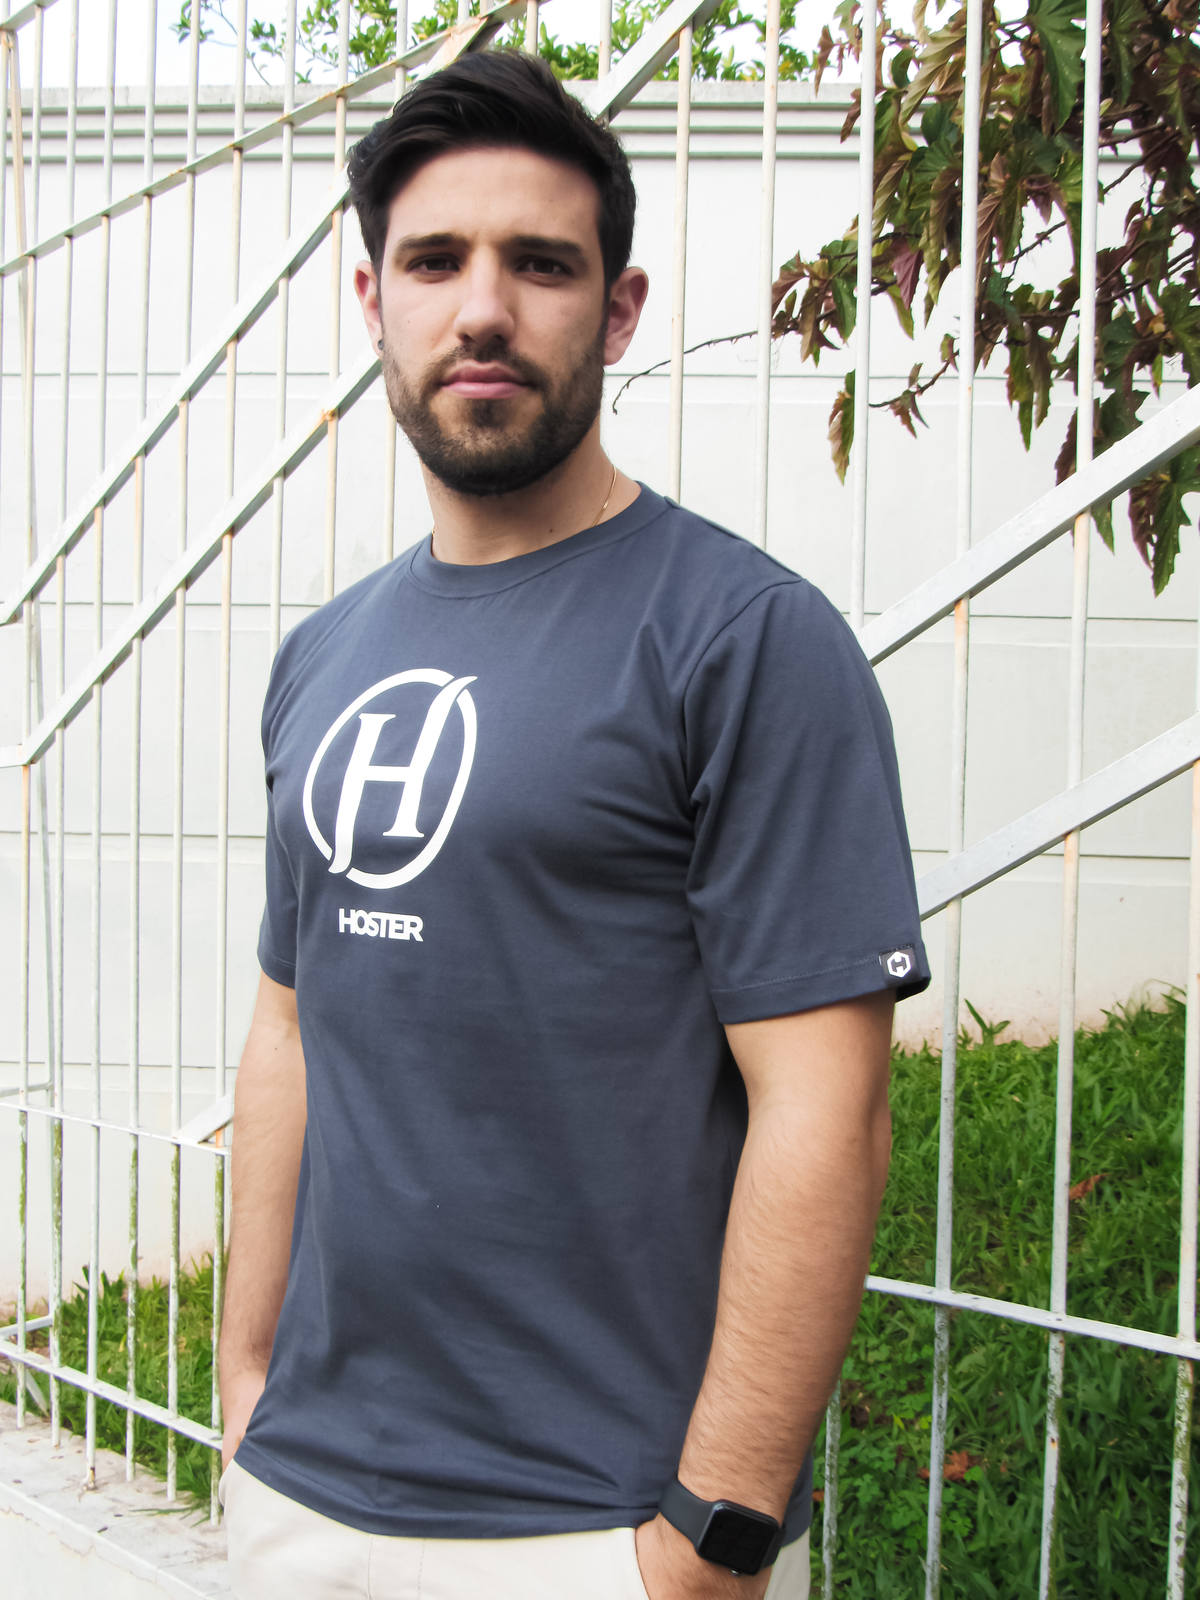 Camiseta HOSTER Cinza Chumbo On Board